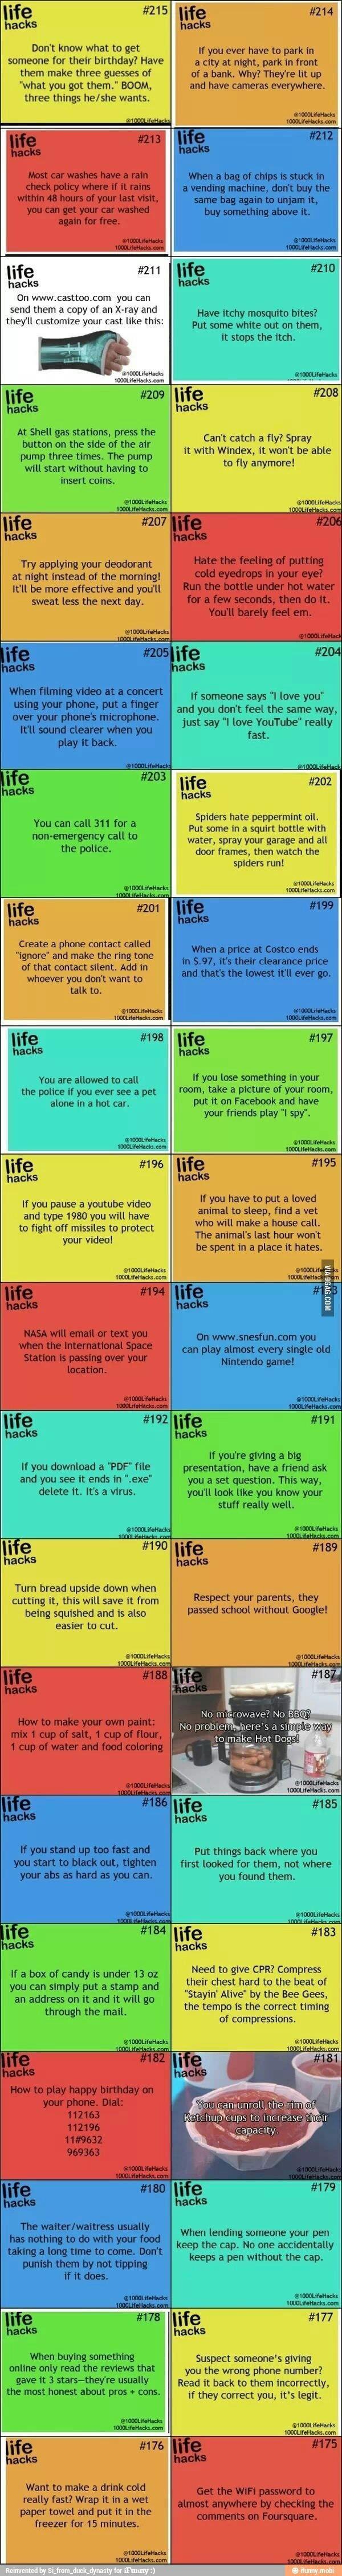 AllCreated - life hacks